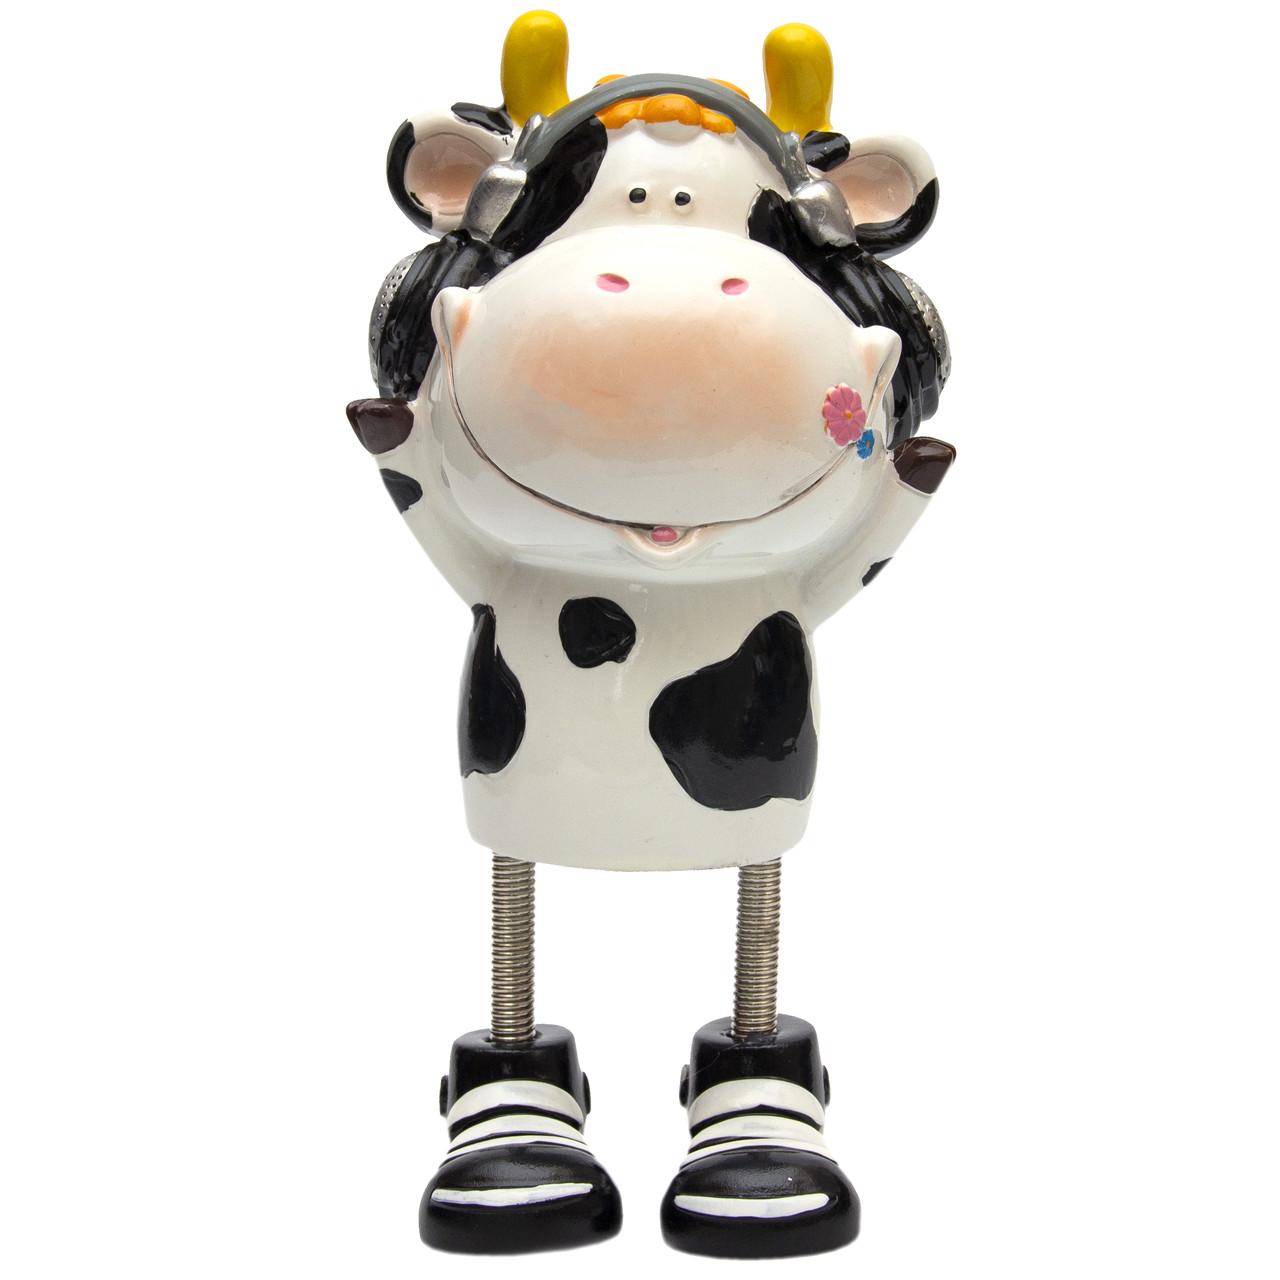 Сувенирная фигурка, корова - копилка (240722)